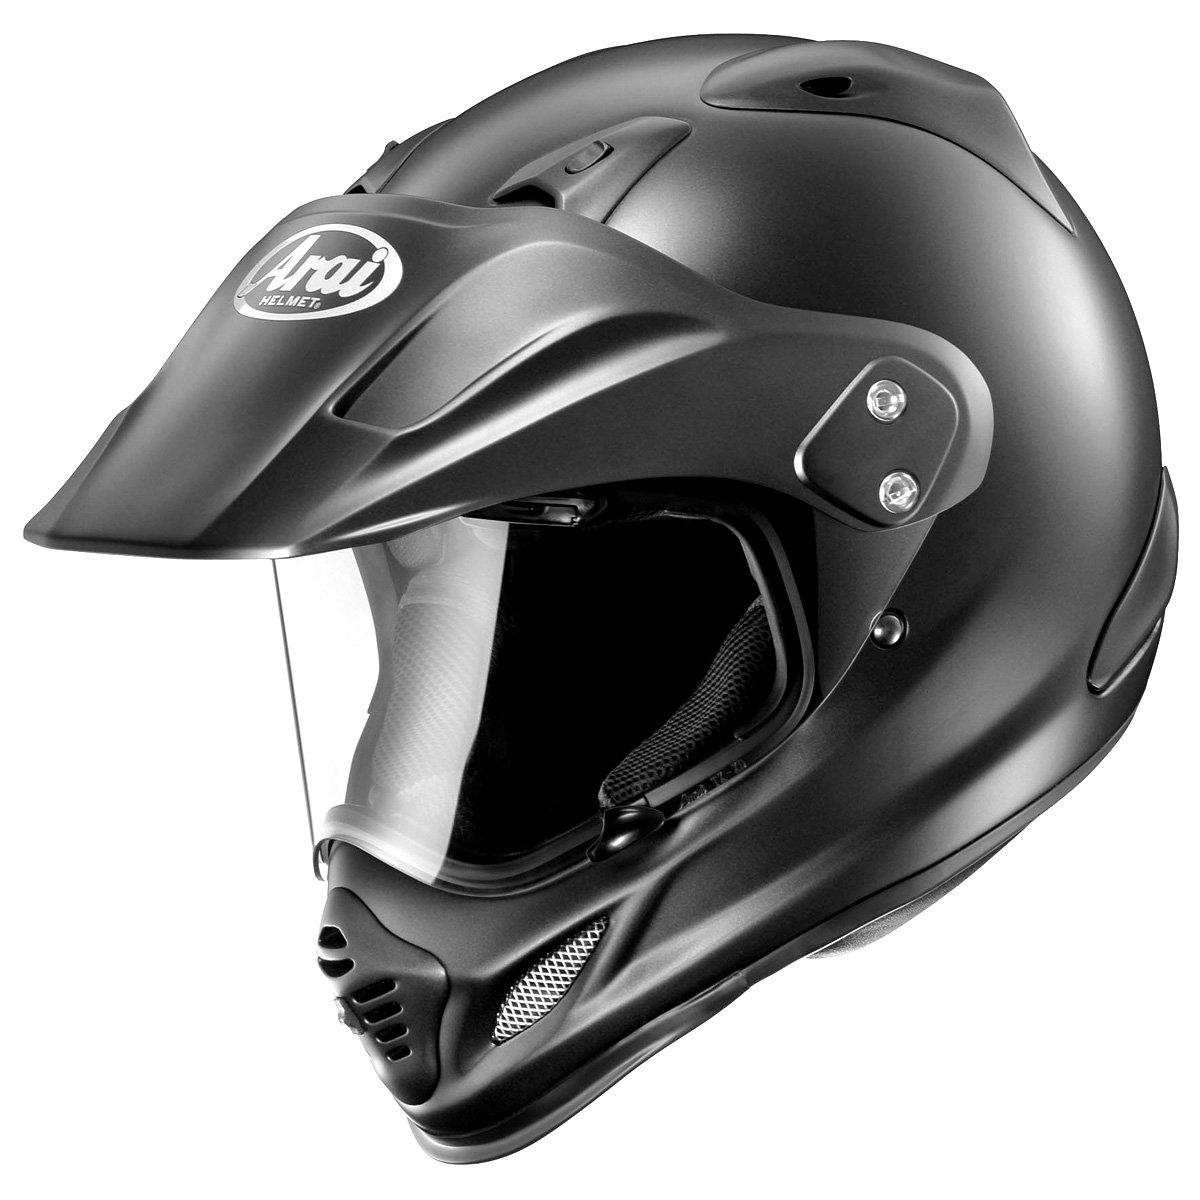 Arai XD4 Black Frost Dual Sport Helmet - Small by Arai (Image #1)